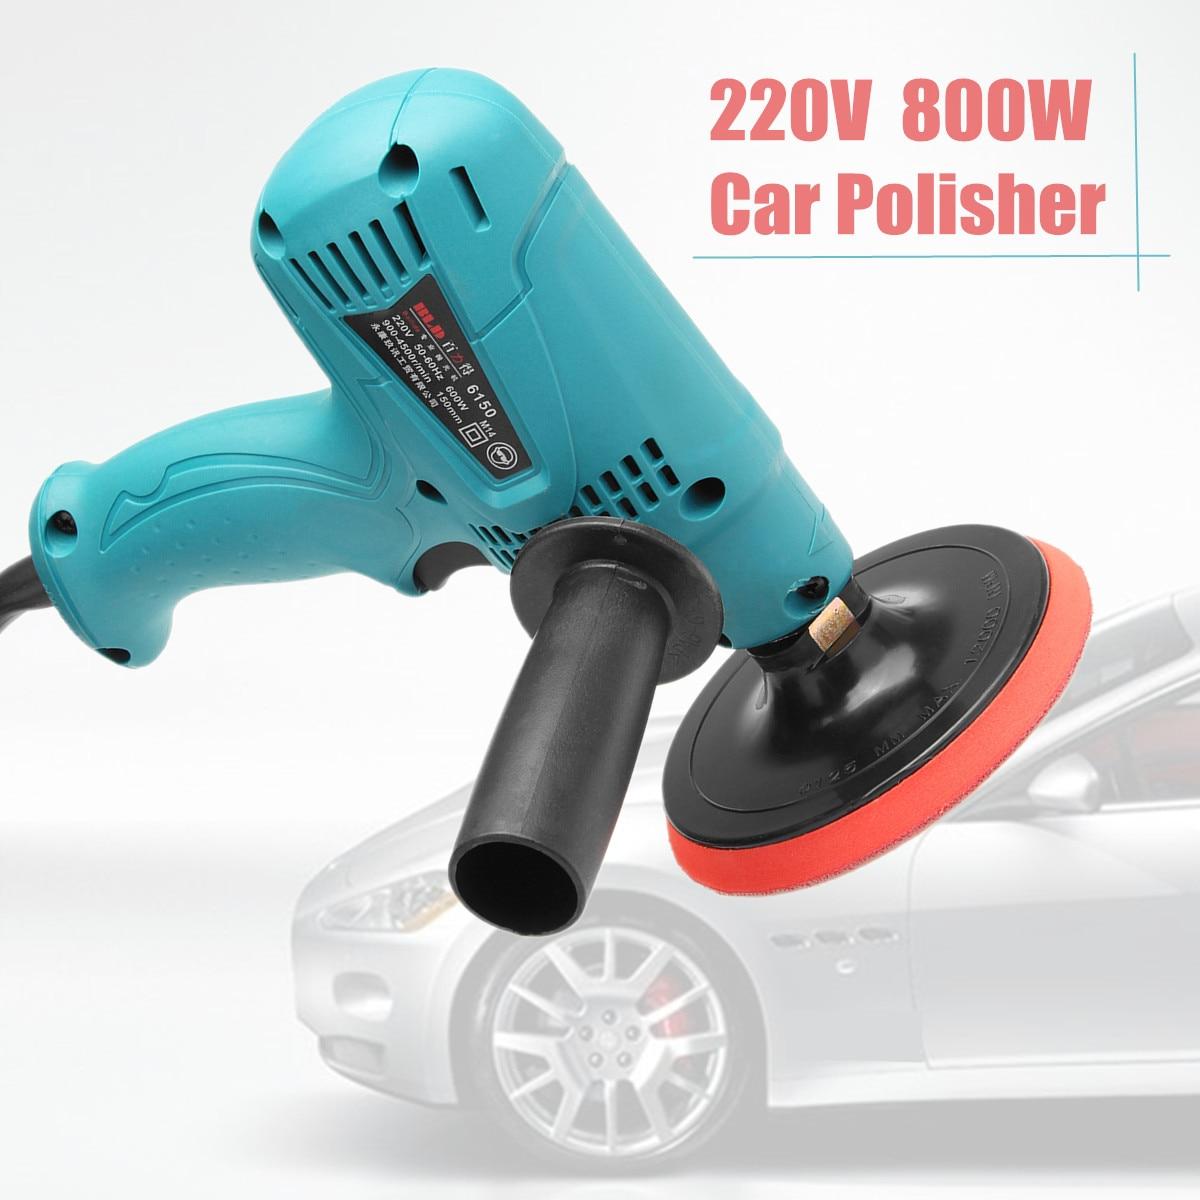 цена на 220V 800W Car Polisher 3500r/min Speed Adjustable Electric Car Boat Polishing Waxing Sander Buffer